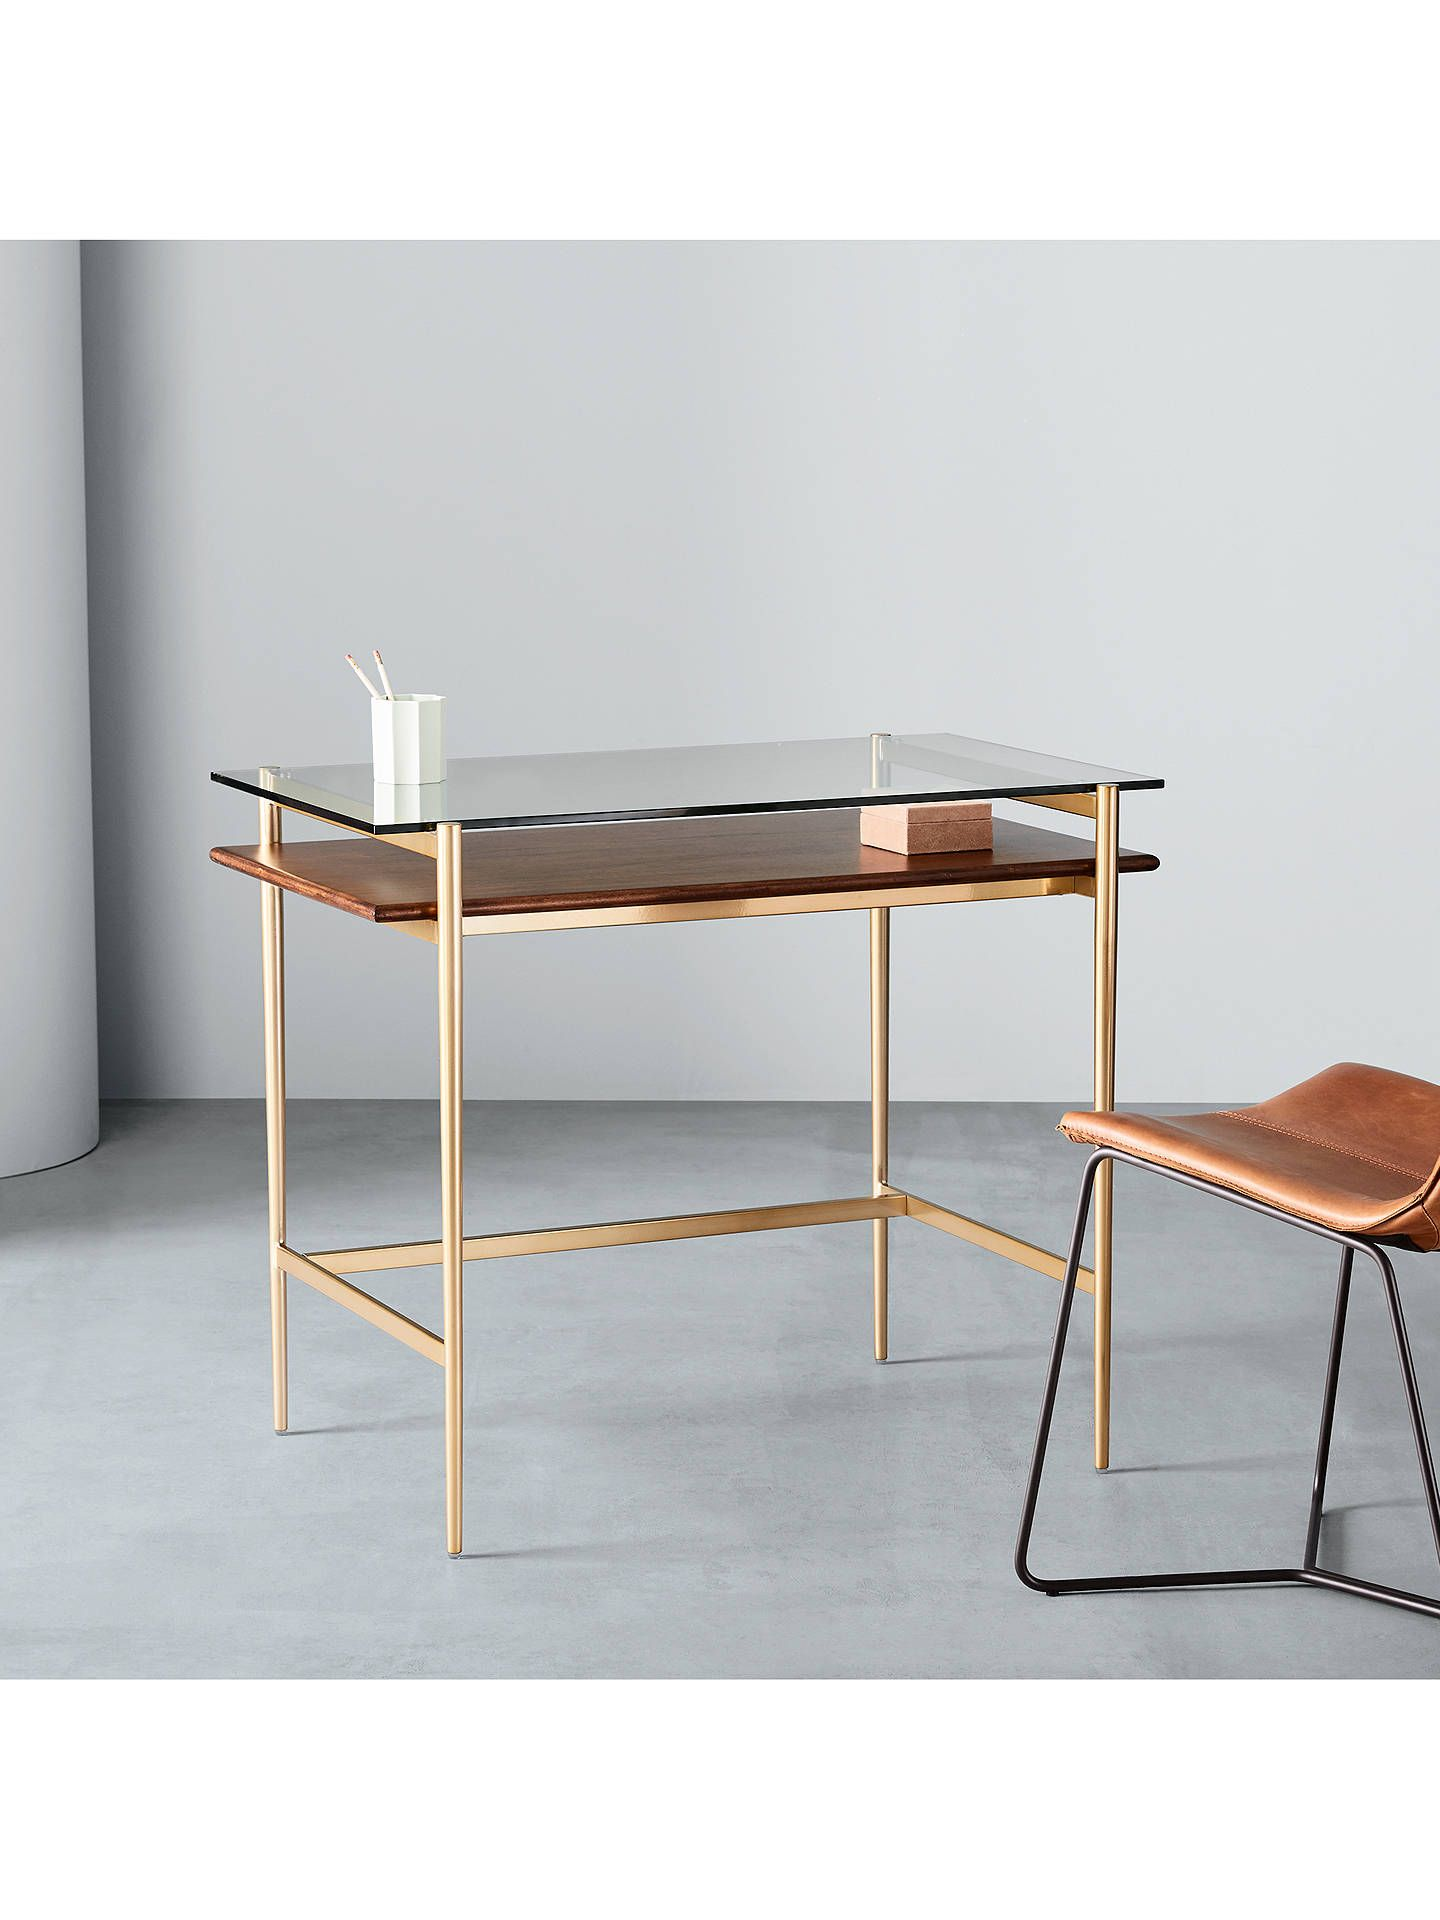 West Elm Art Display Mini Desk Walnut Brass In 2020 Glass Work Table Mini Desk West Elm Art